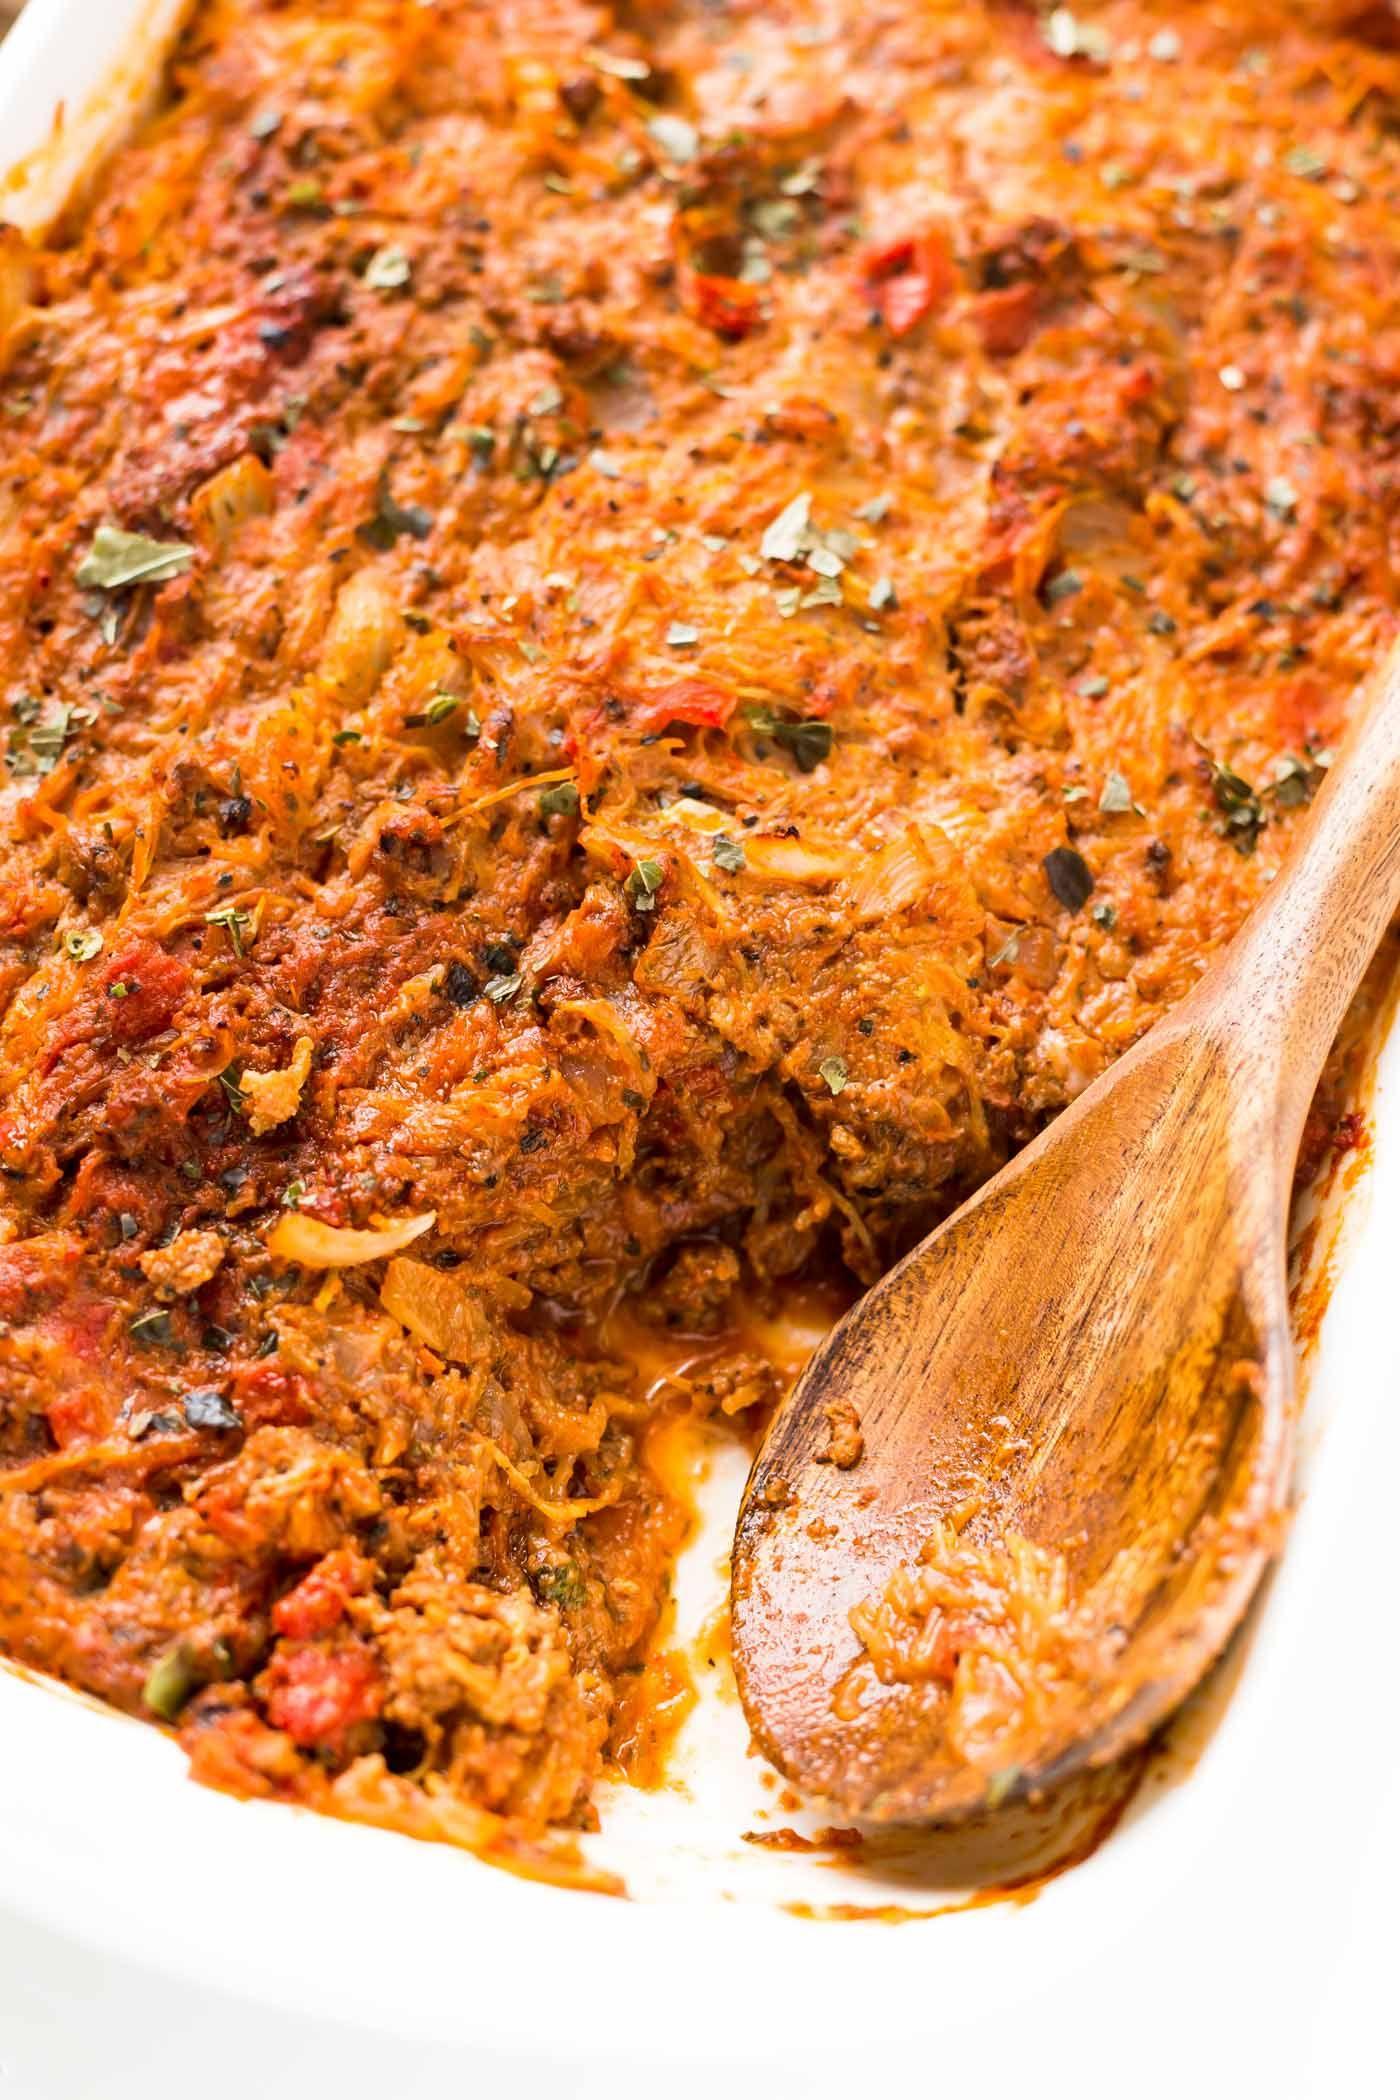 Baked Spaghetti Squash Casserole (Paleo, Whole30,